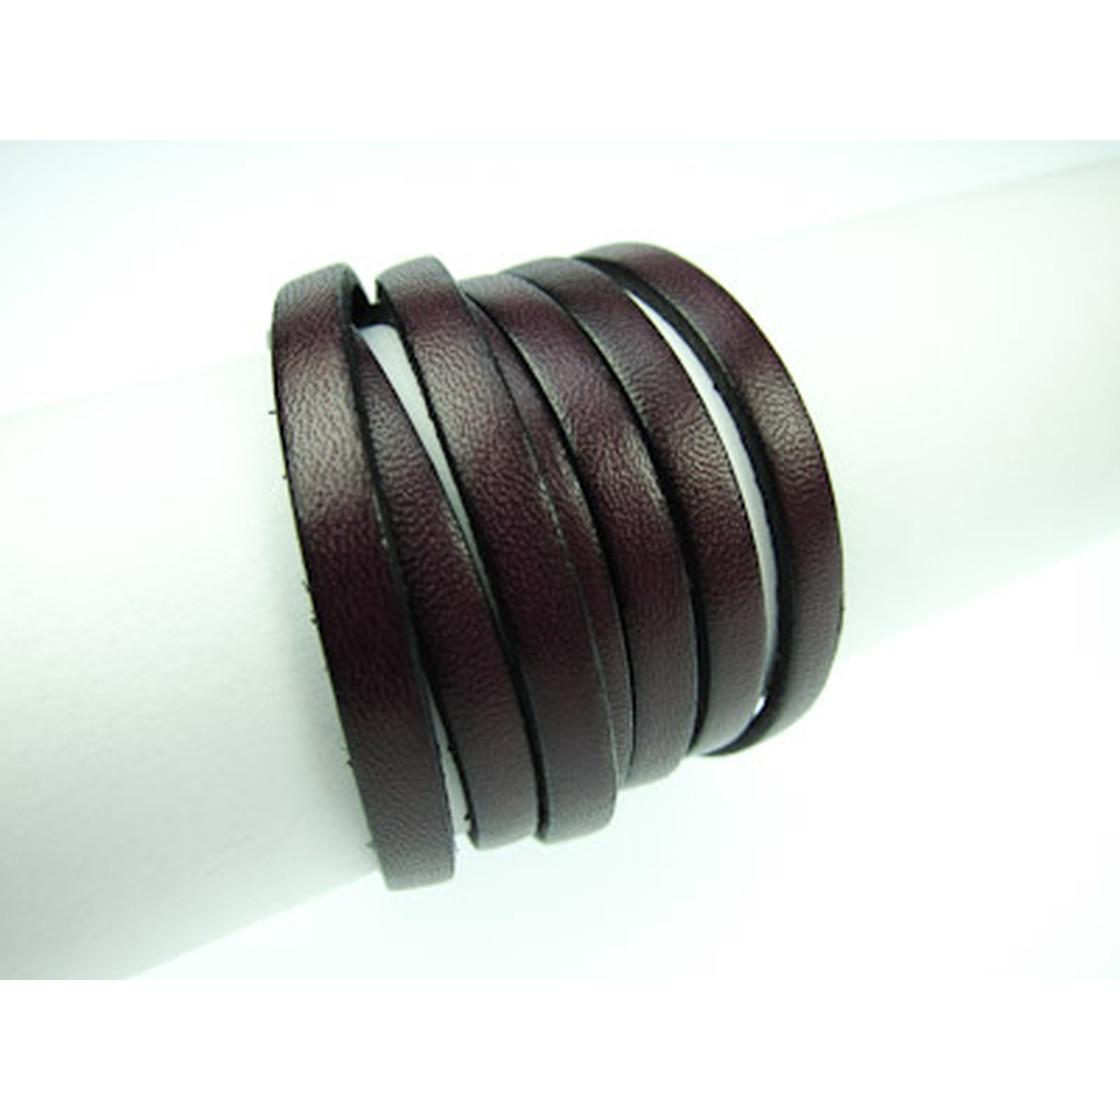 10x2mm Hochwertiges Rindleder schw. Rand 1m Flaches Lederband Mittelgrau